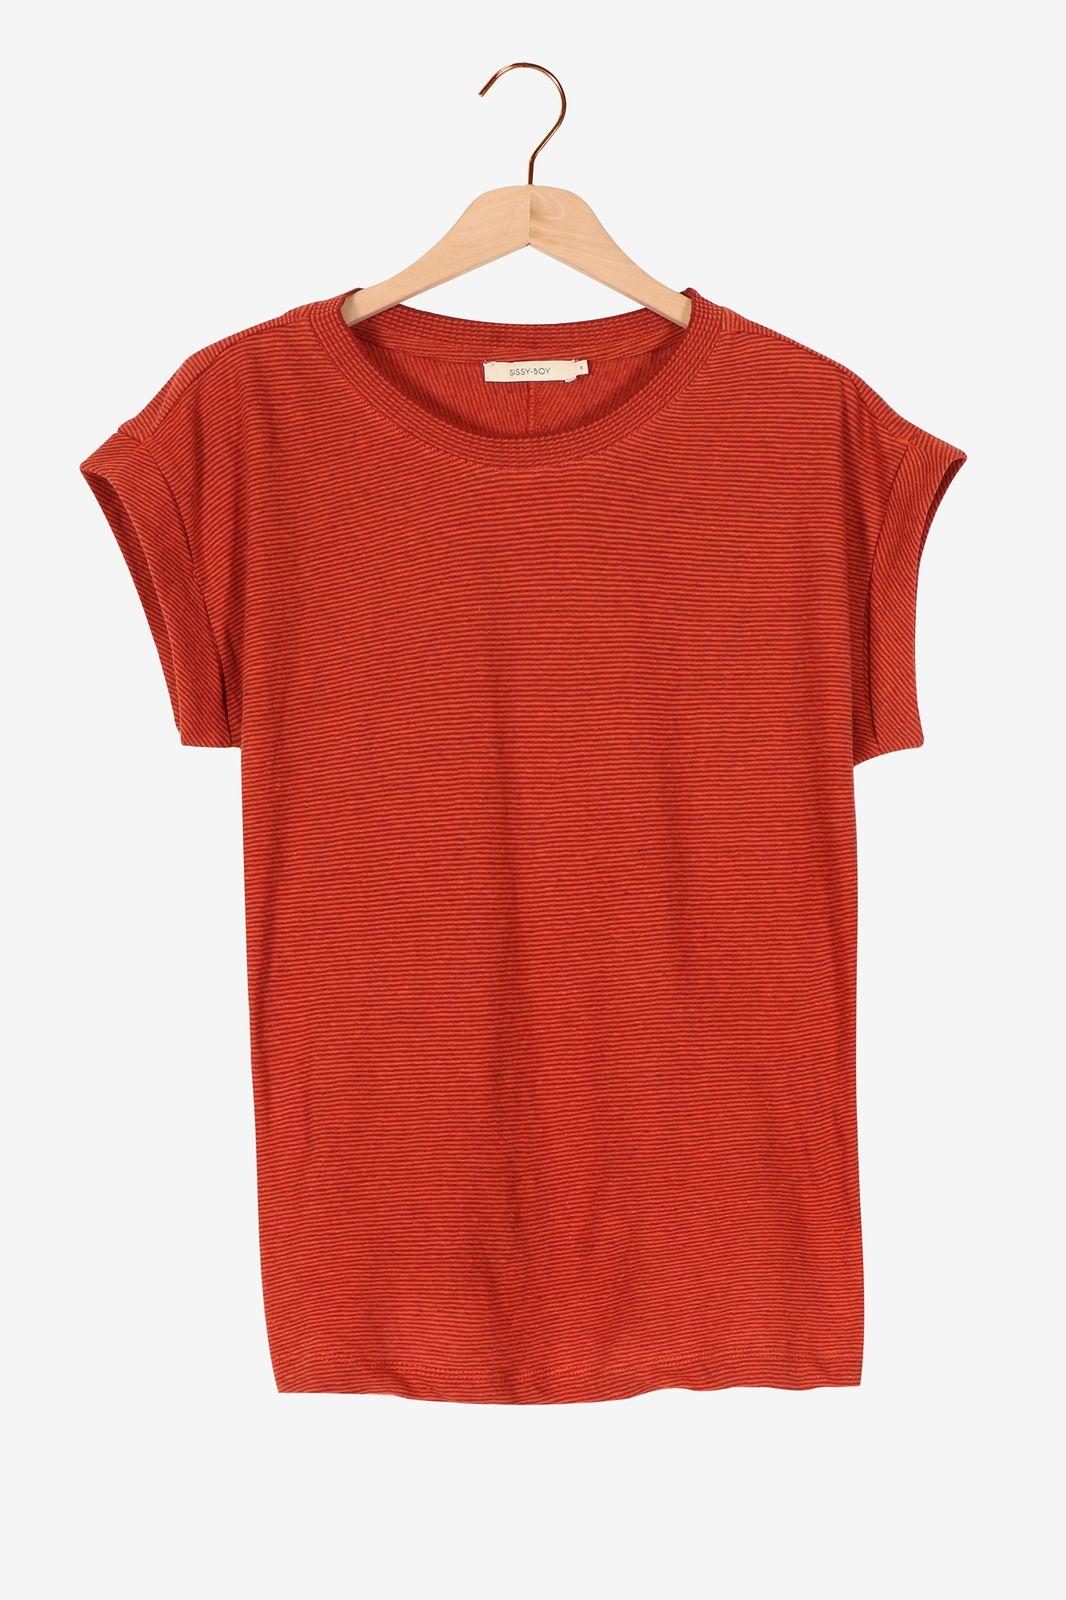 Donkerrood t-shirt gestreept